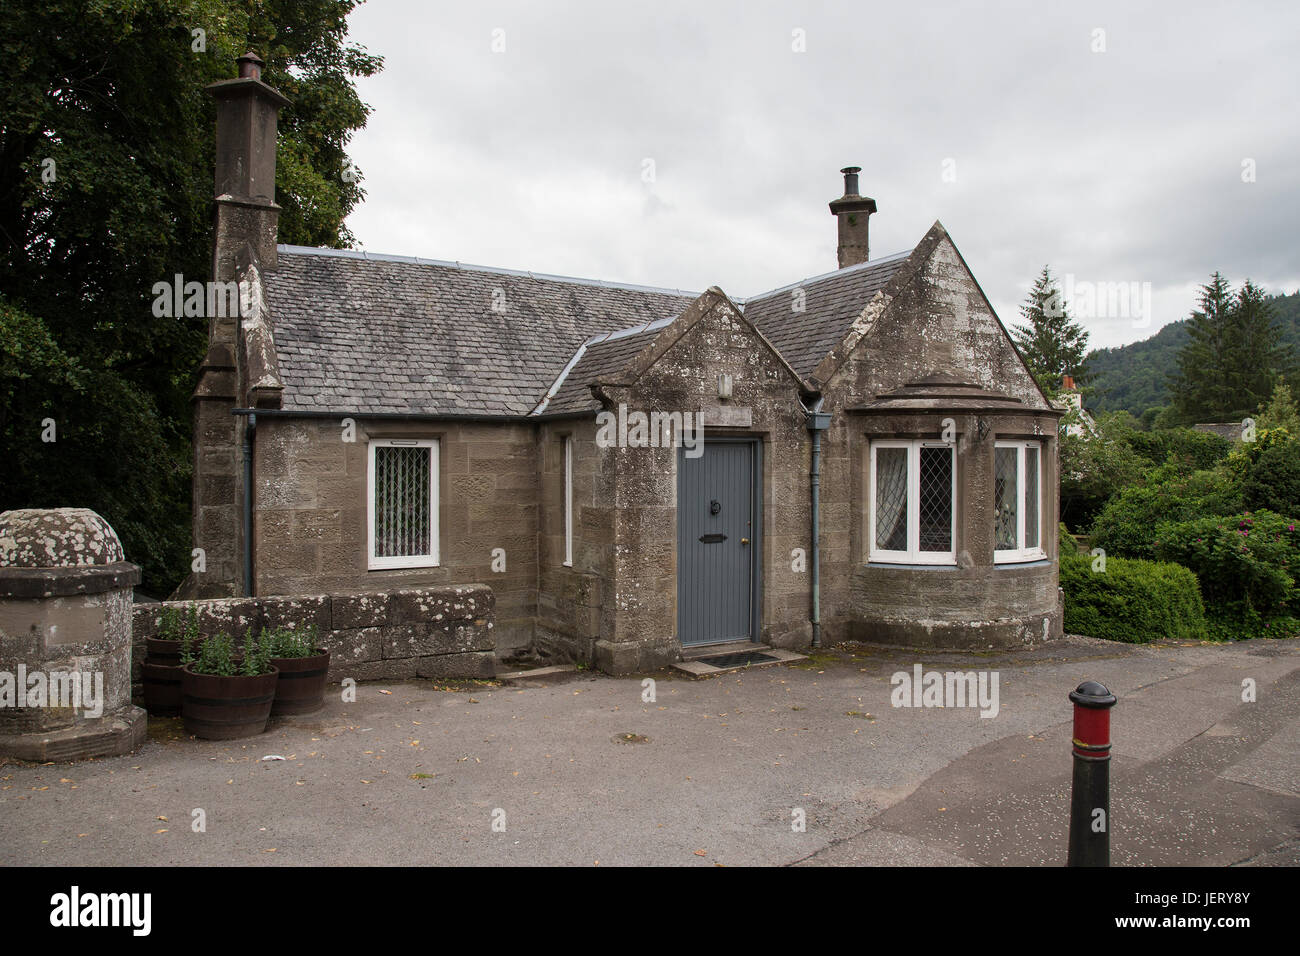 Toll House on the River Tay bridge at Dunkeld, Scotland - Stock Image